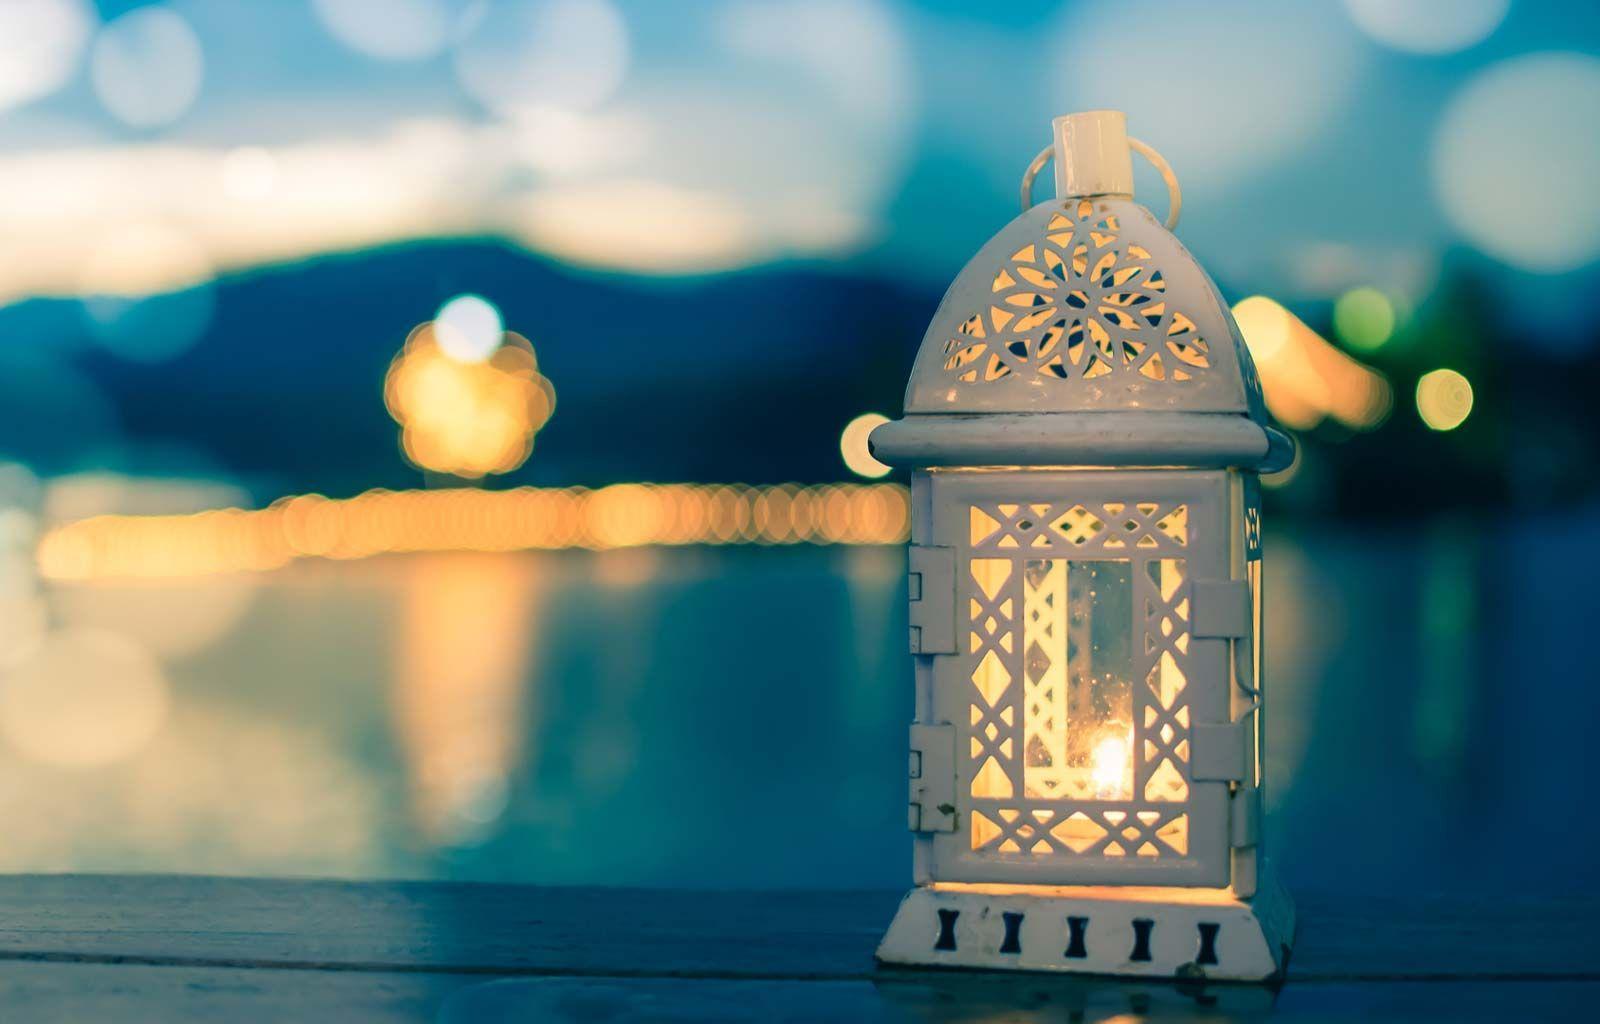 Post Ramadan Challenges 9 Ideas To Keep On Track About Islam Ramadan Islam Ramadan Lantern